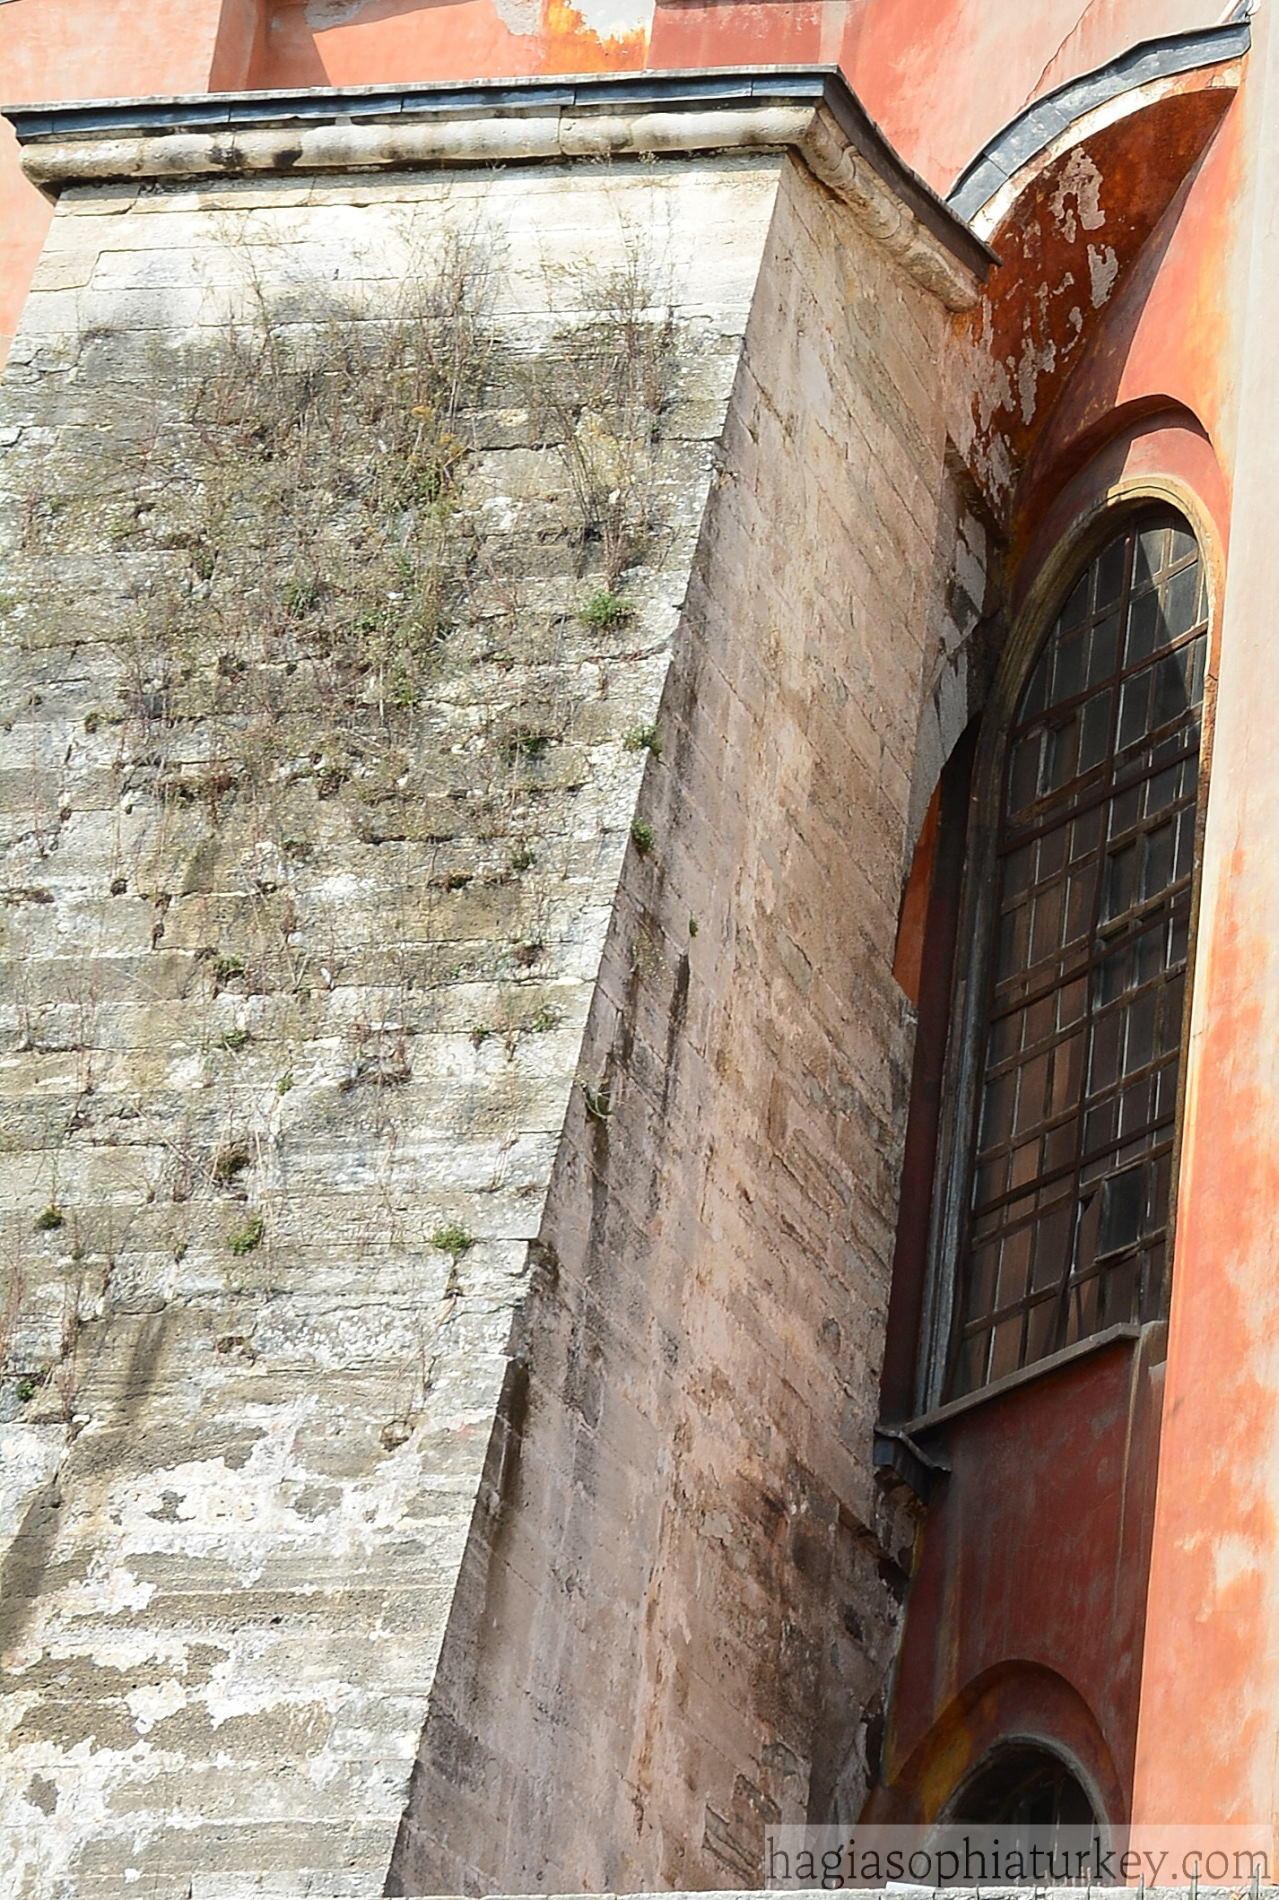 History Of Us Science Fiction And Fantasy Magazines To: History Of Hagia Sophia